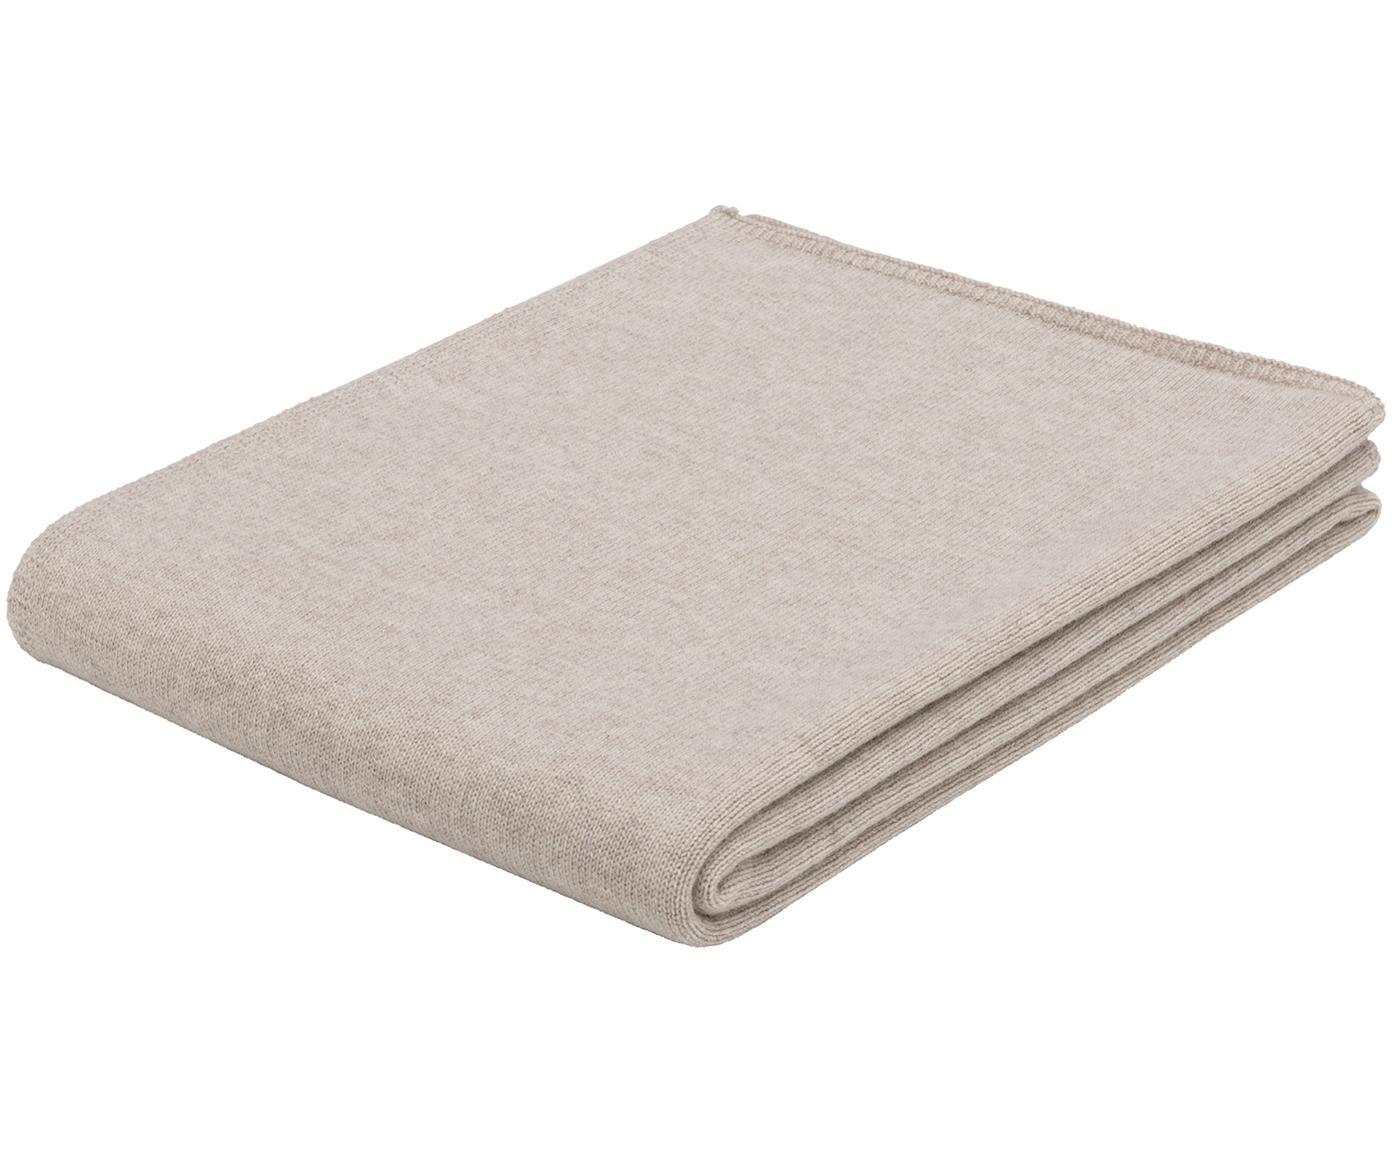 Manta de cachemira finamente tejida Viviana, 70%cachemira, 30%lana merino, Beige, An 130 x L 170 cm